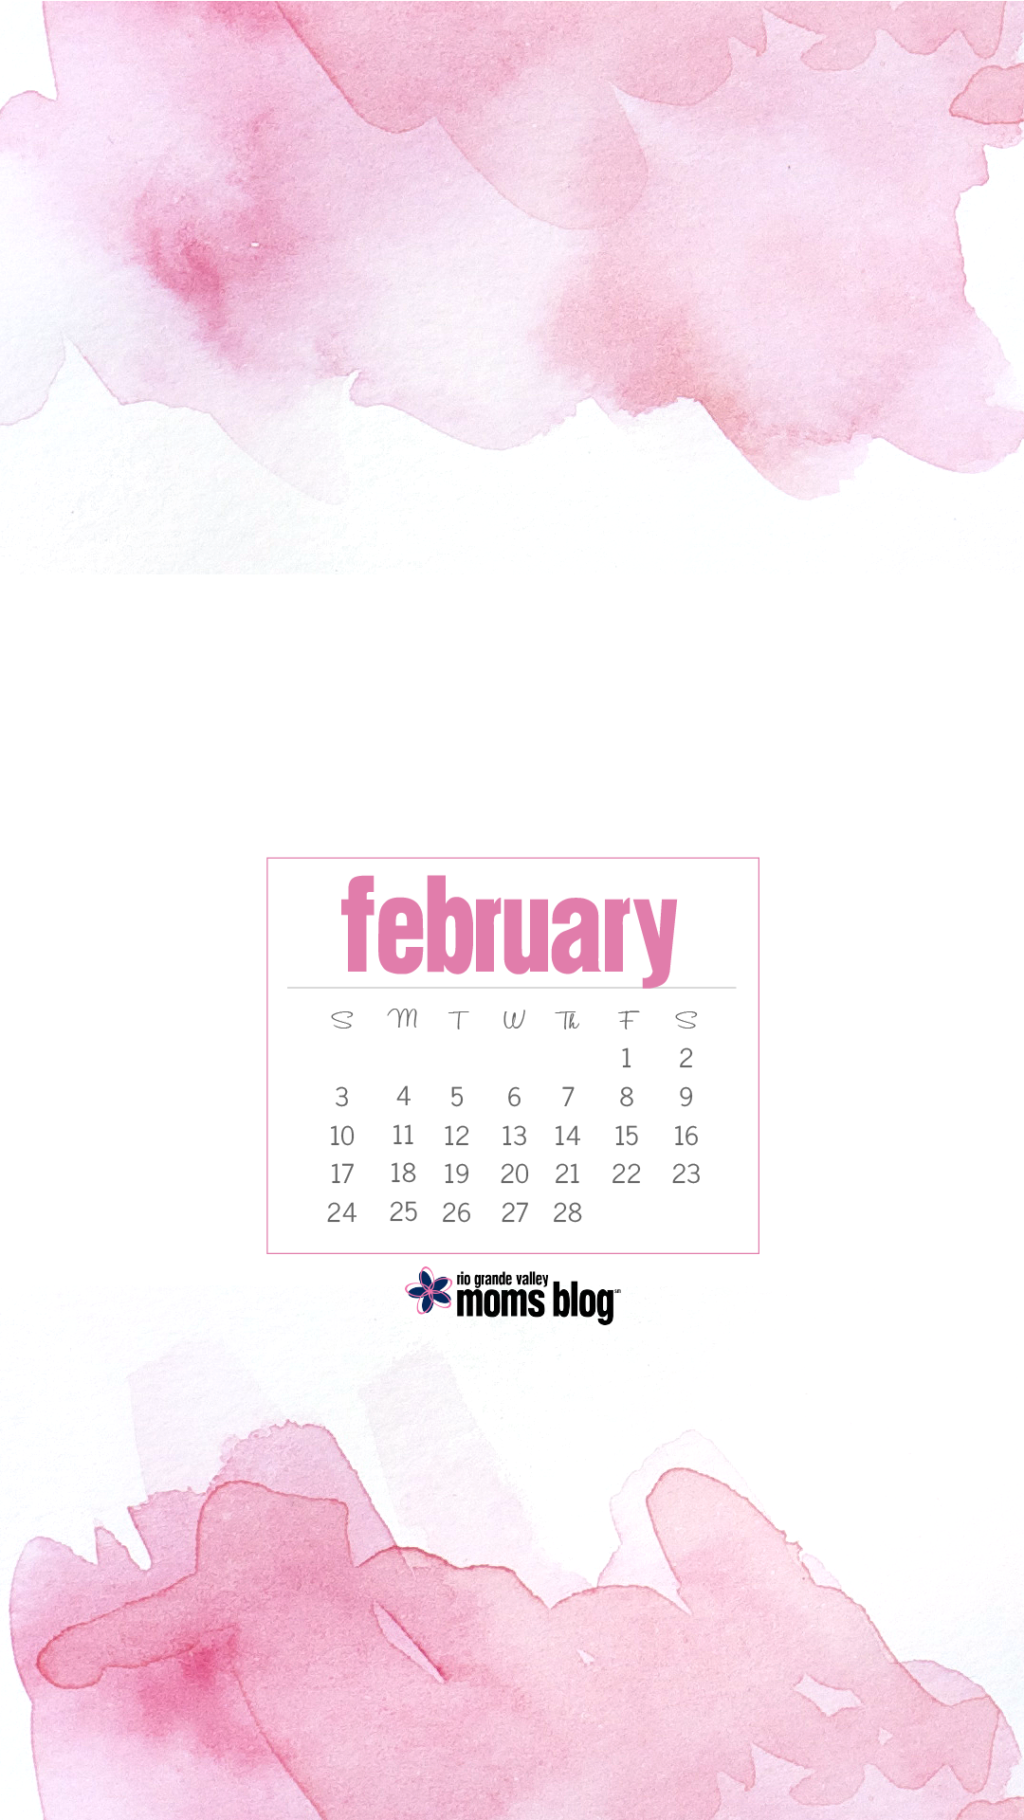 February 2019 - Calendar - Watercolor